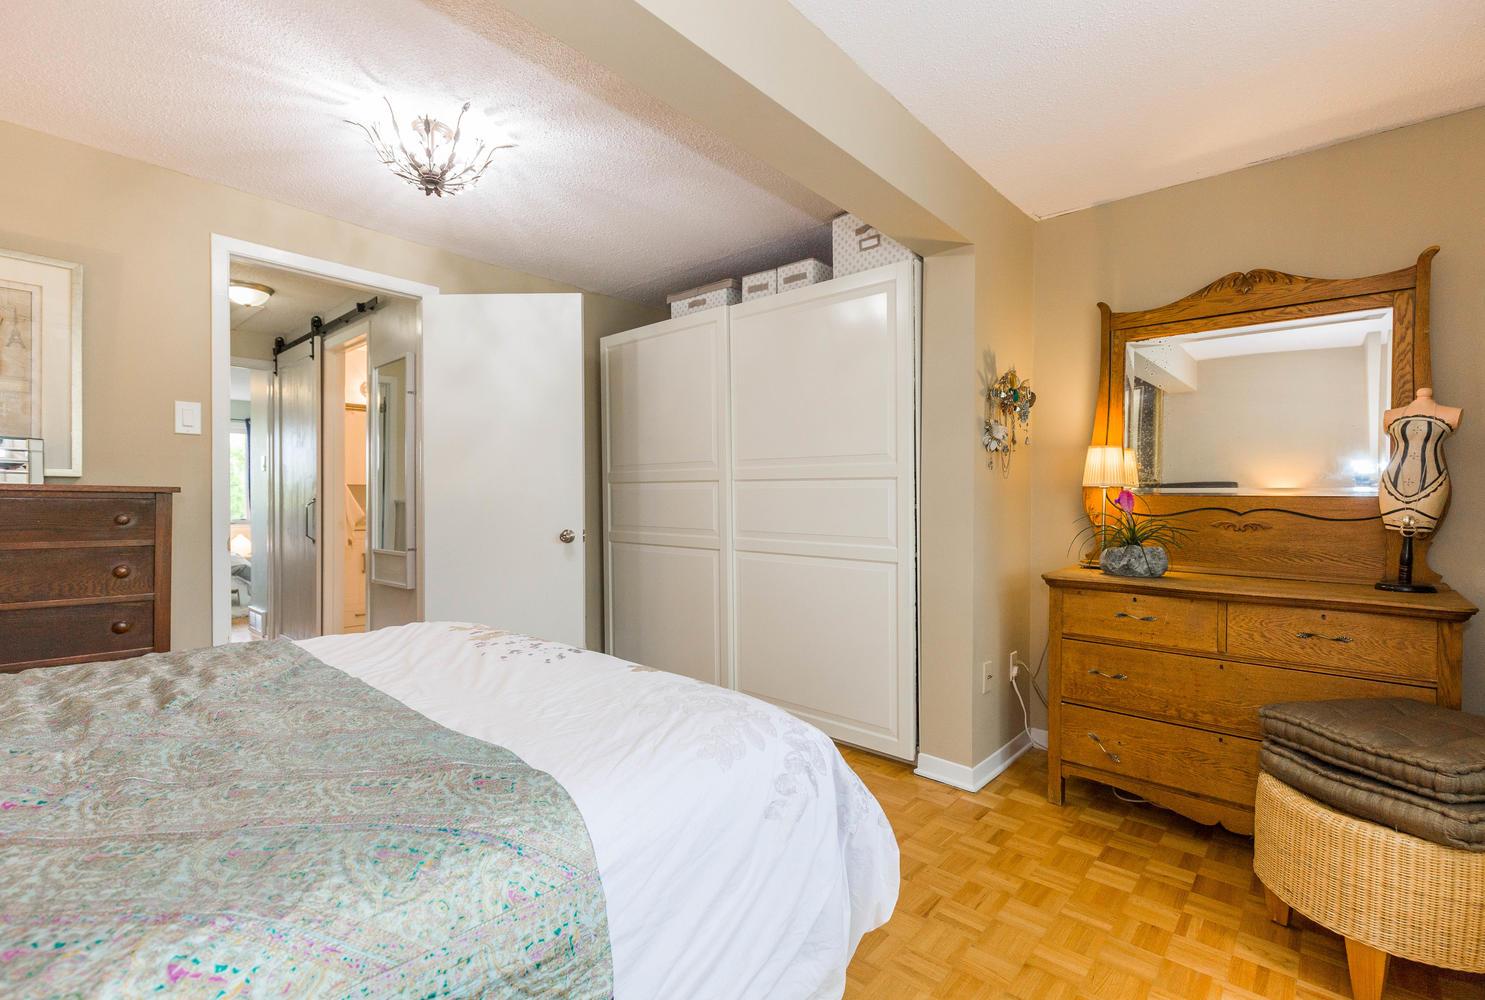 195-Primrose-Ave-Ottawa-ON-K1R-large-018-3-Master-Bedroom-1485x1000-72dpi